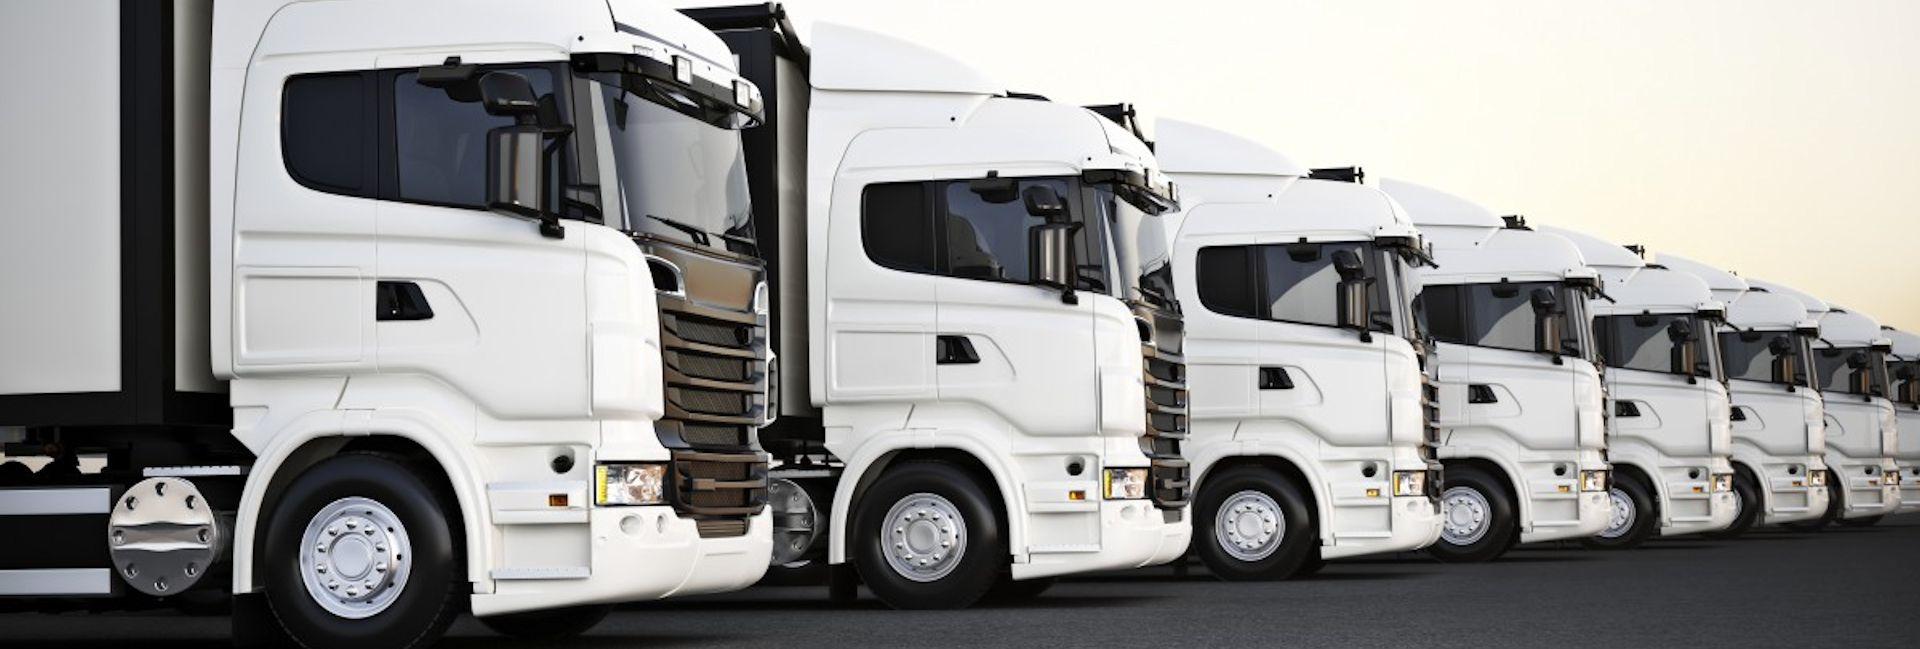 flotta-camion-b